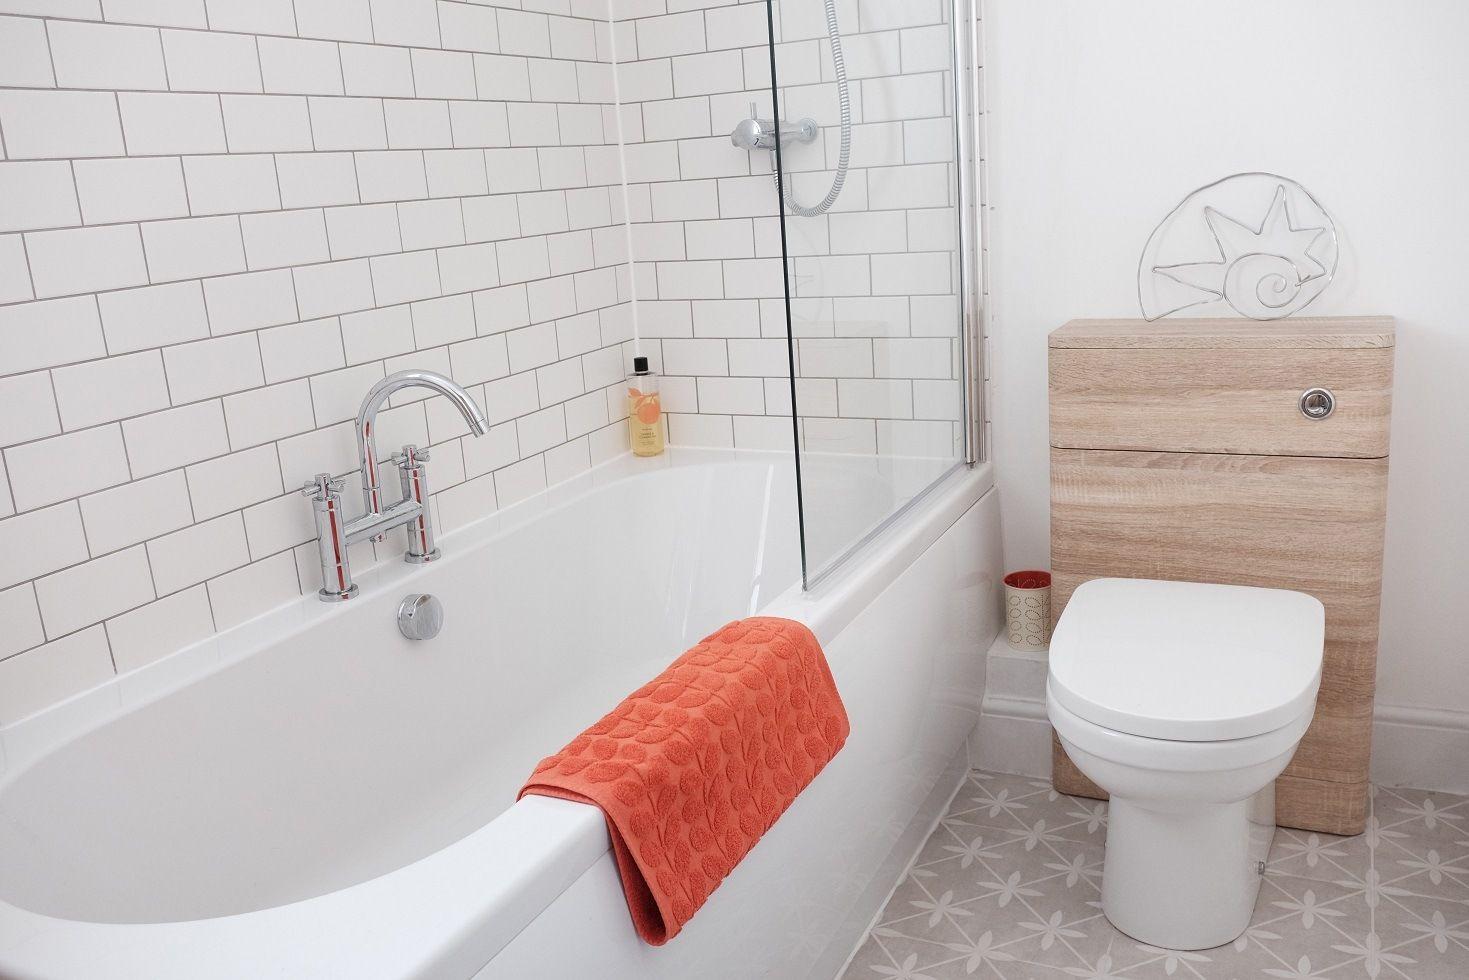 Related image Mold in bathroom, Small bathroom